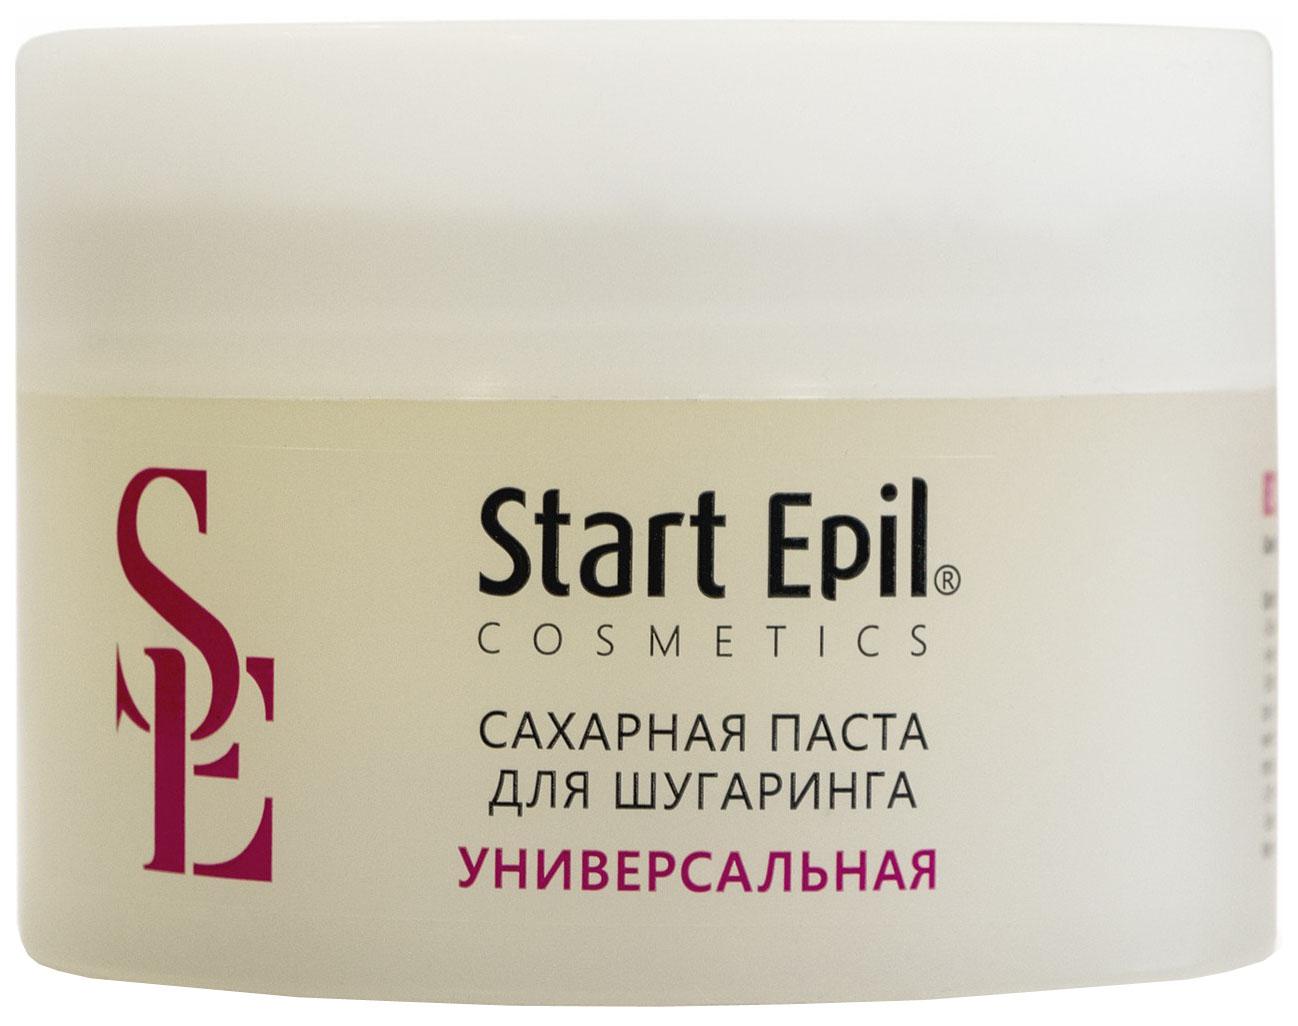 Паста для шугаринга Aravia Professional Start Epil